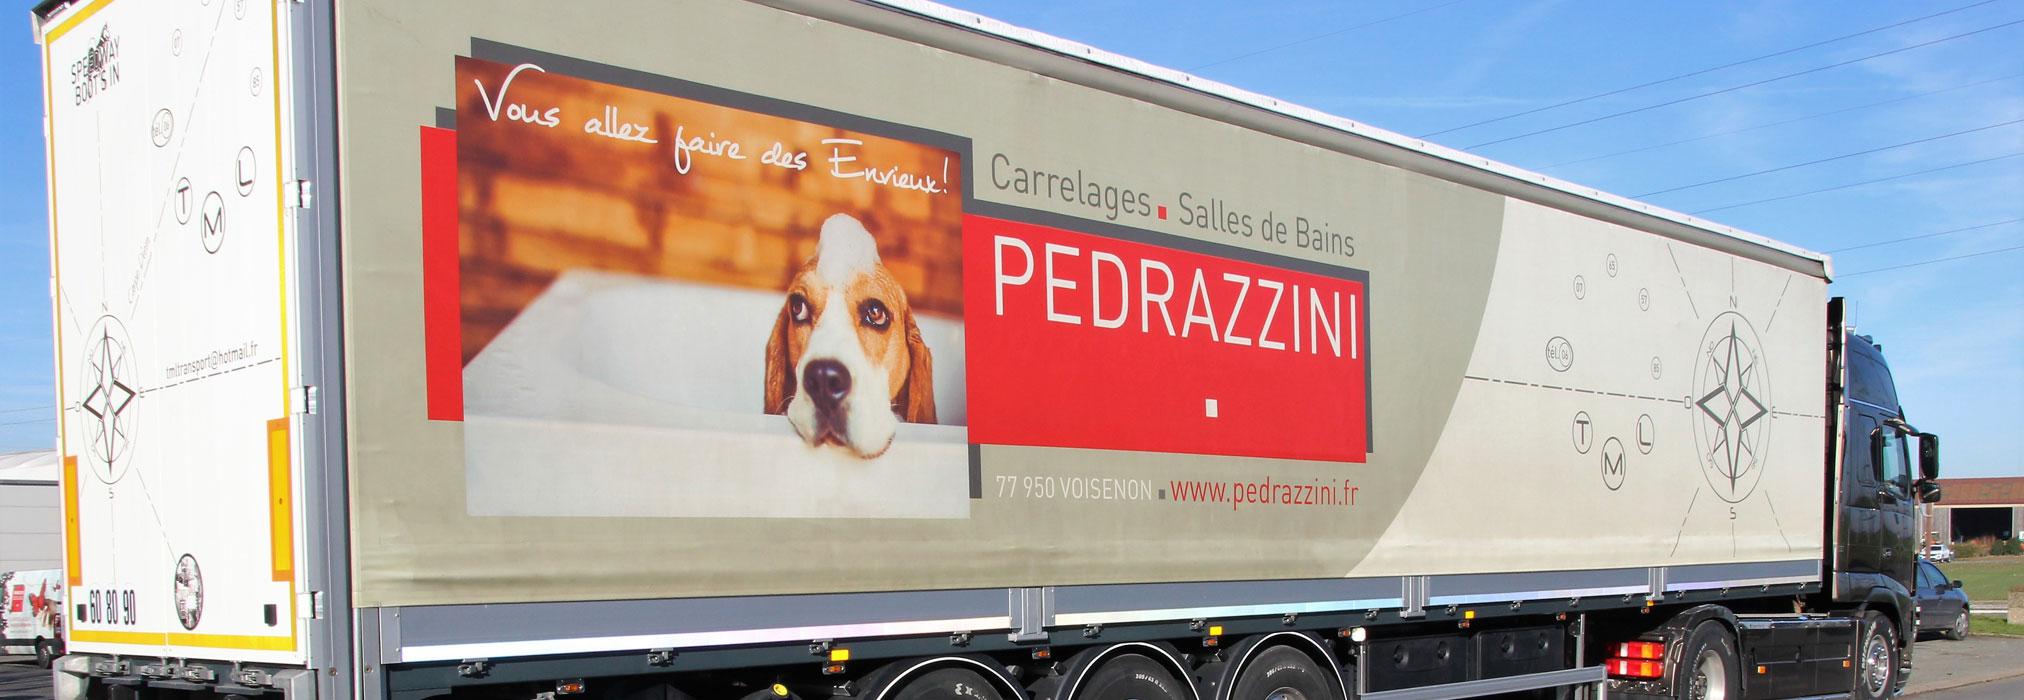 Pedrazzini vente de carrelage en seine et marne